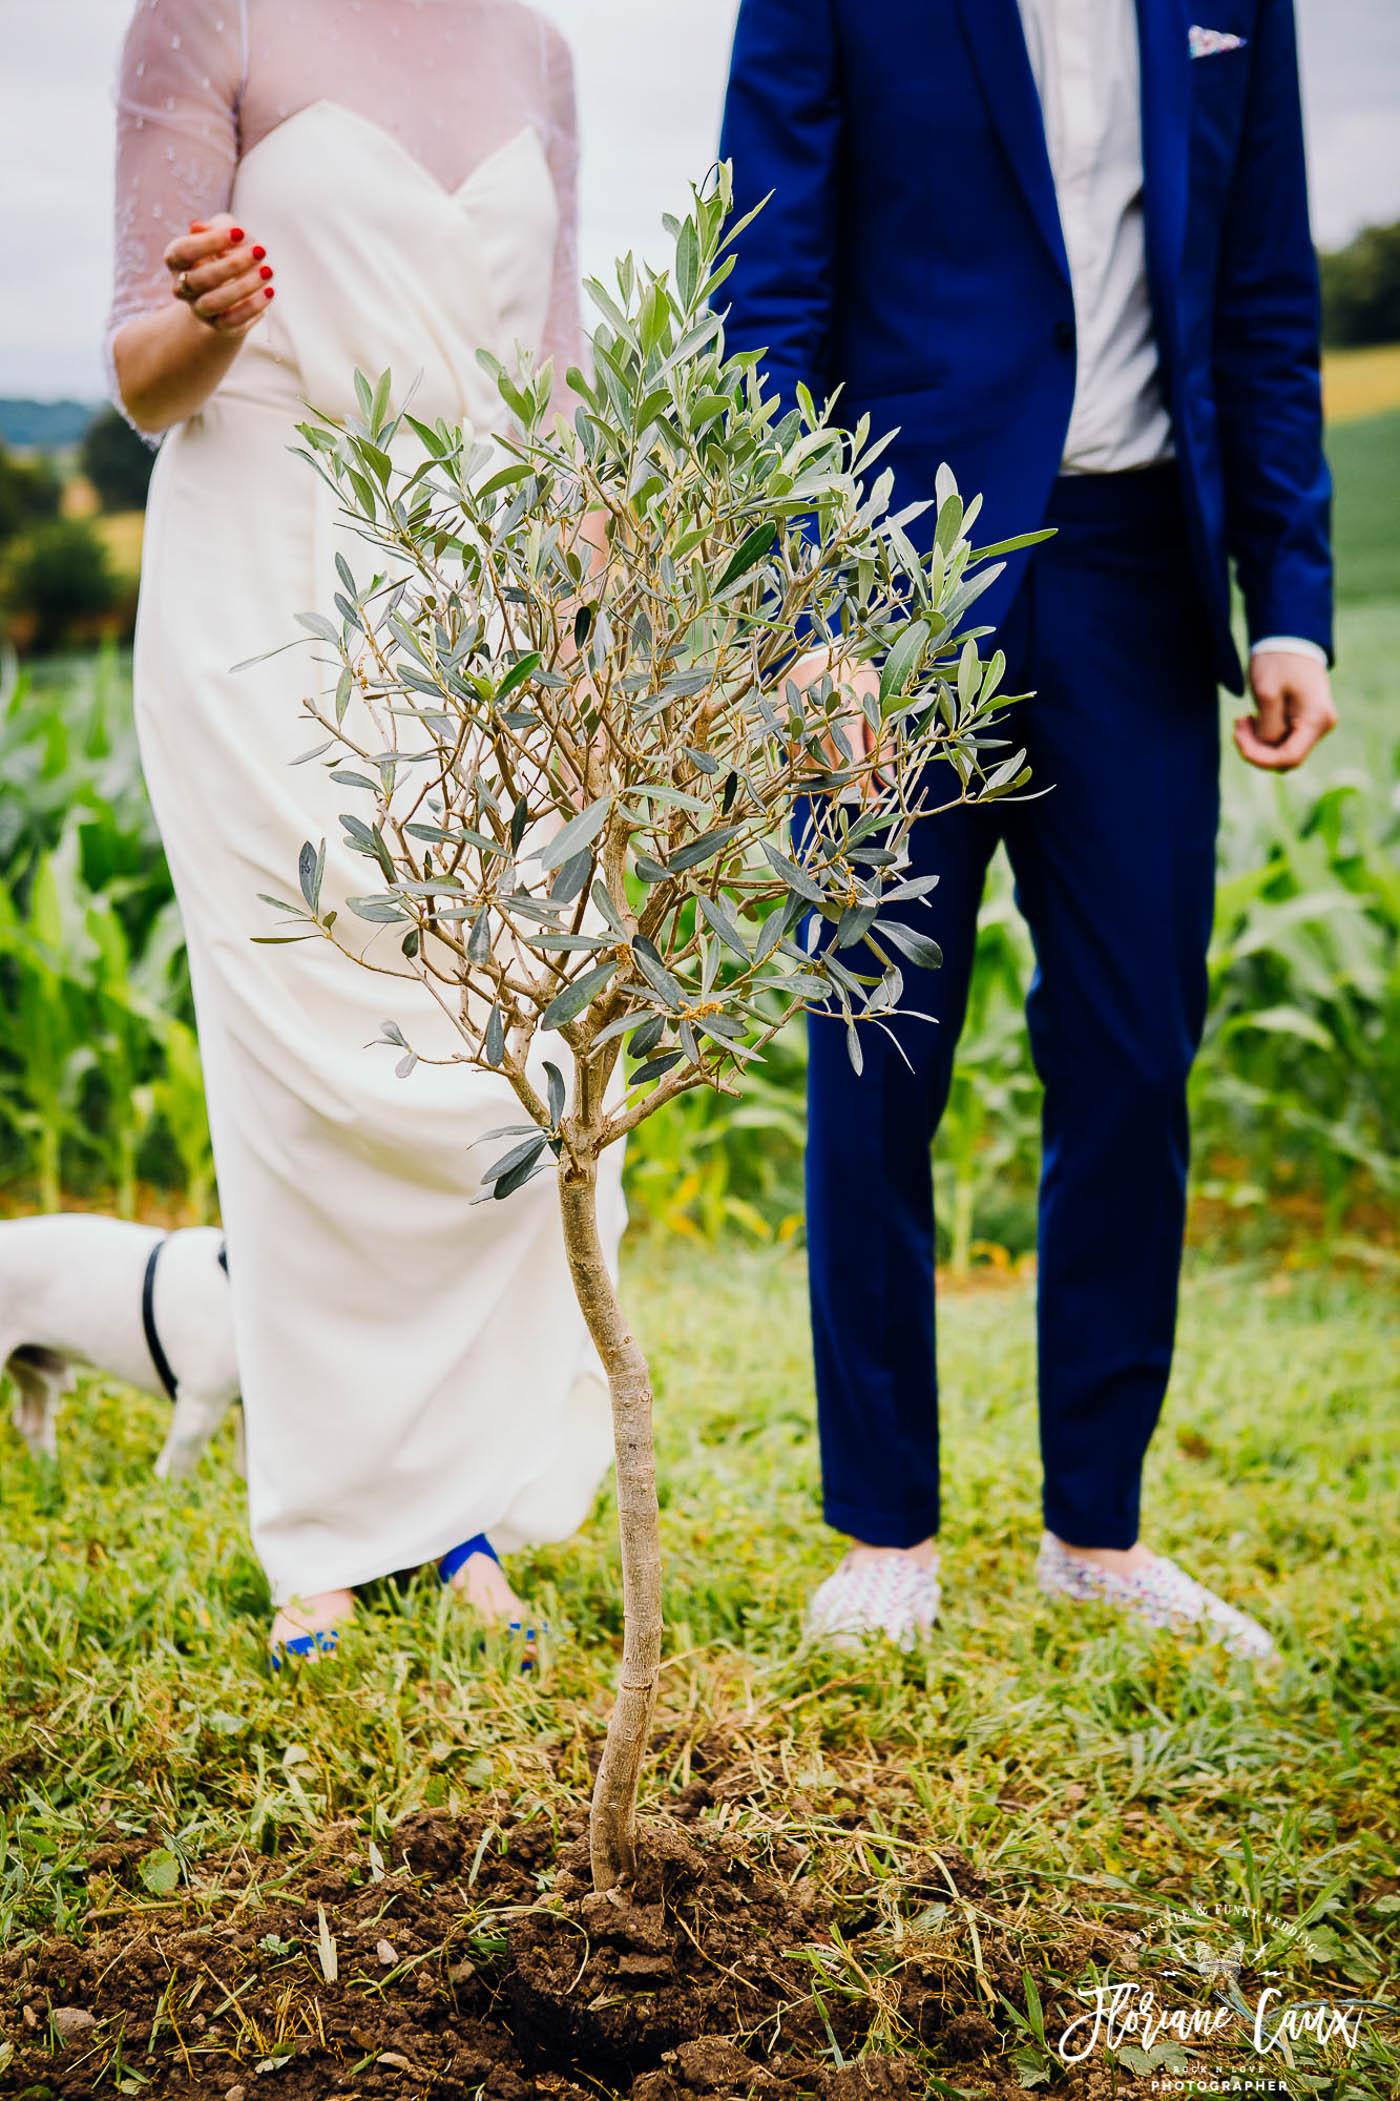 photographe-mariage-pays-basque-Floriane-Caux (37)